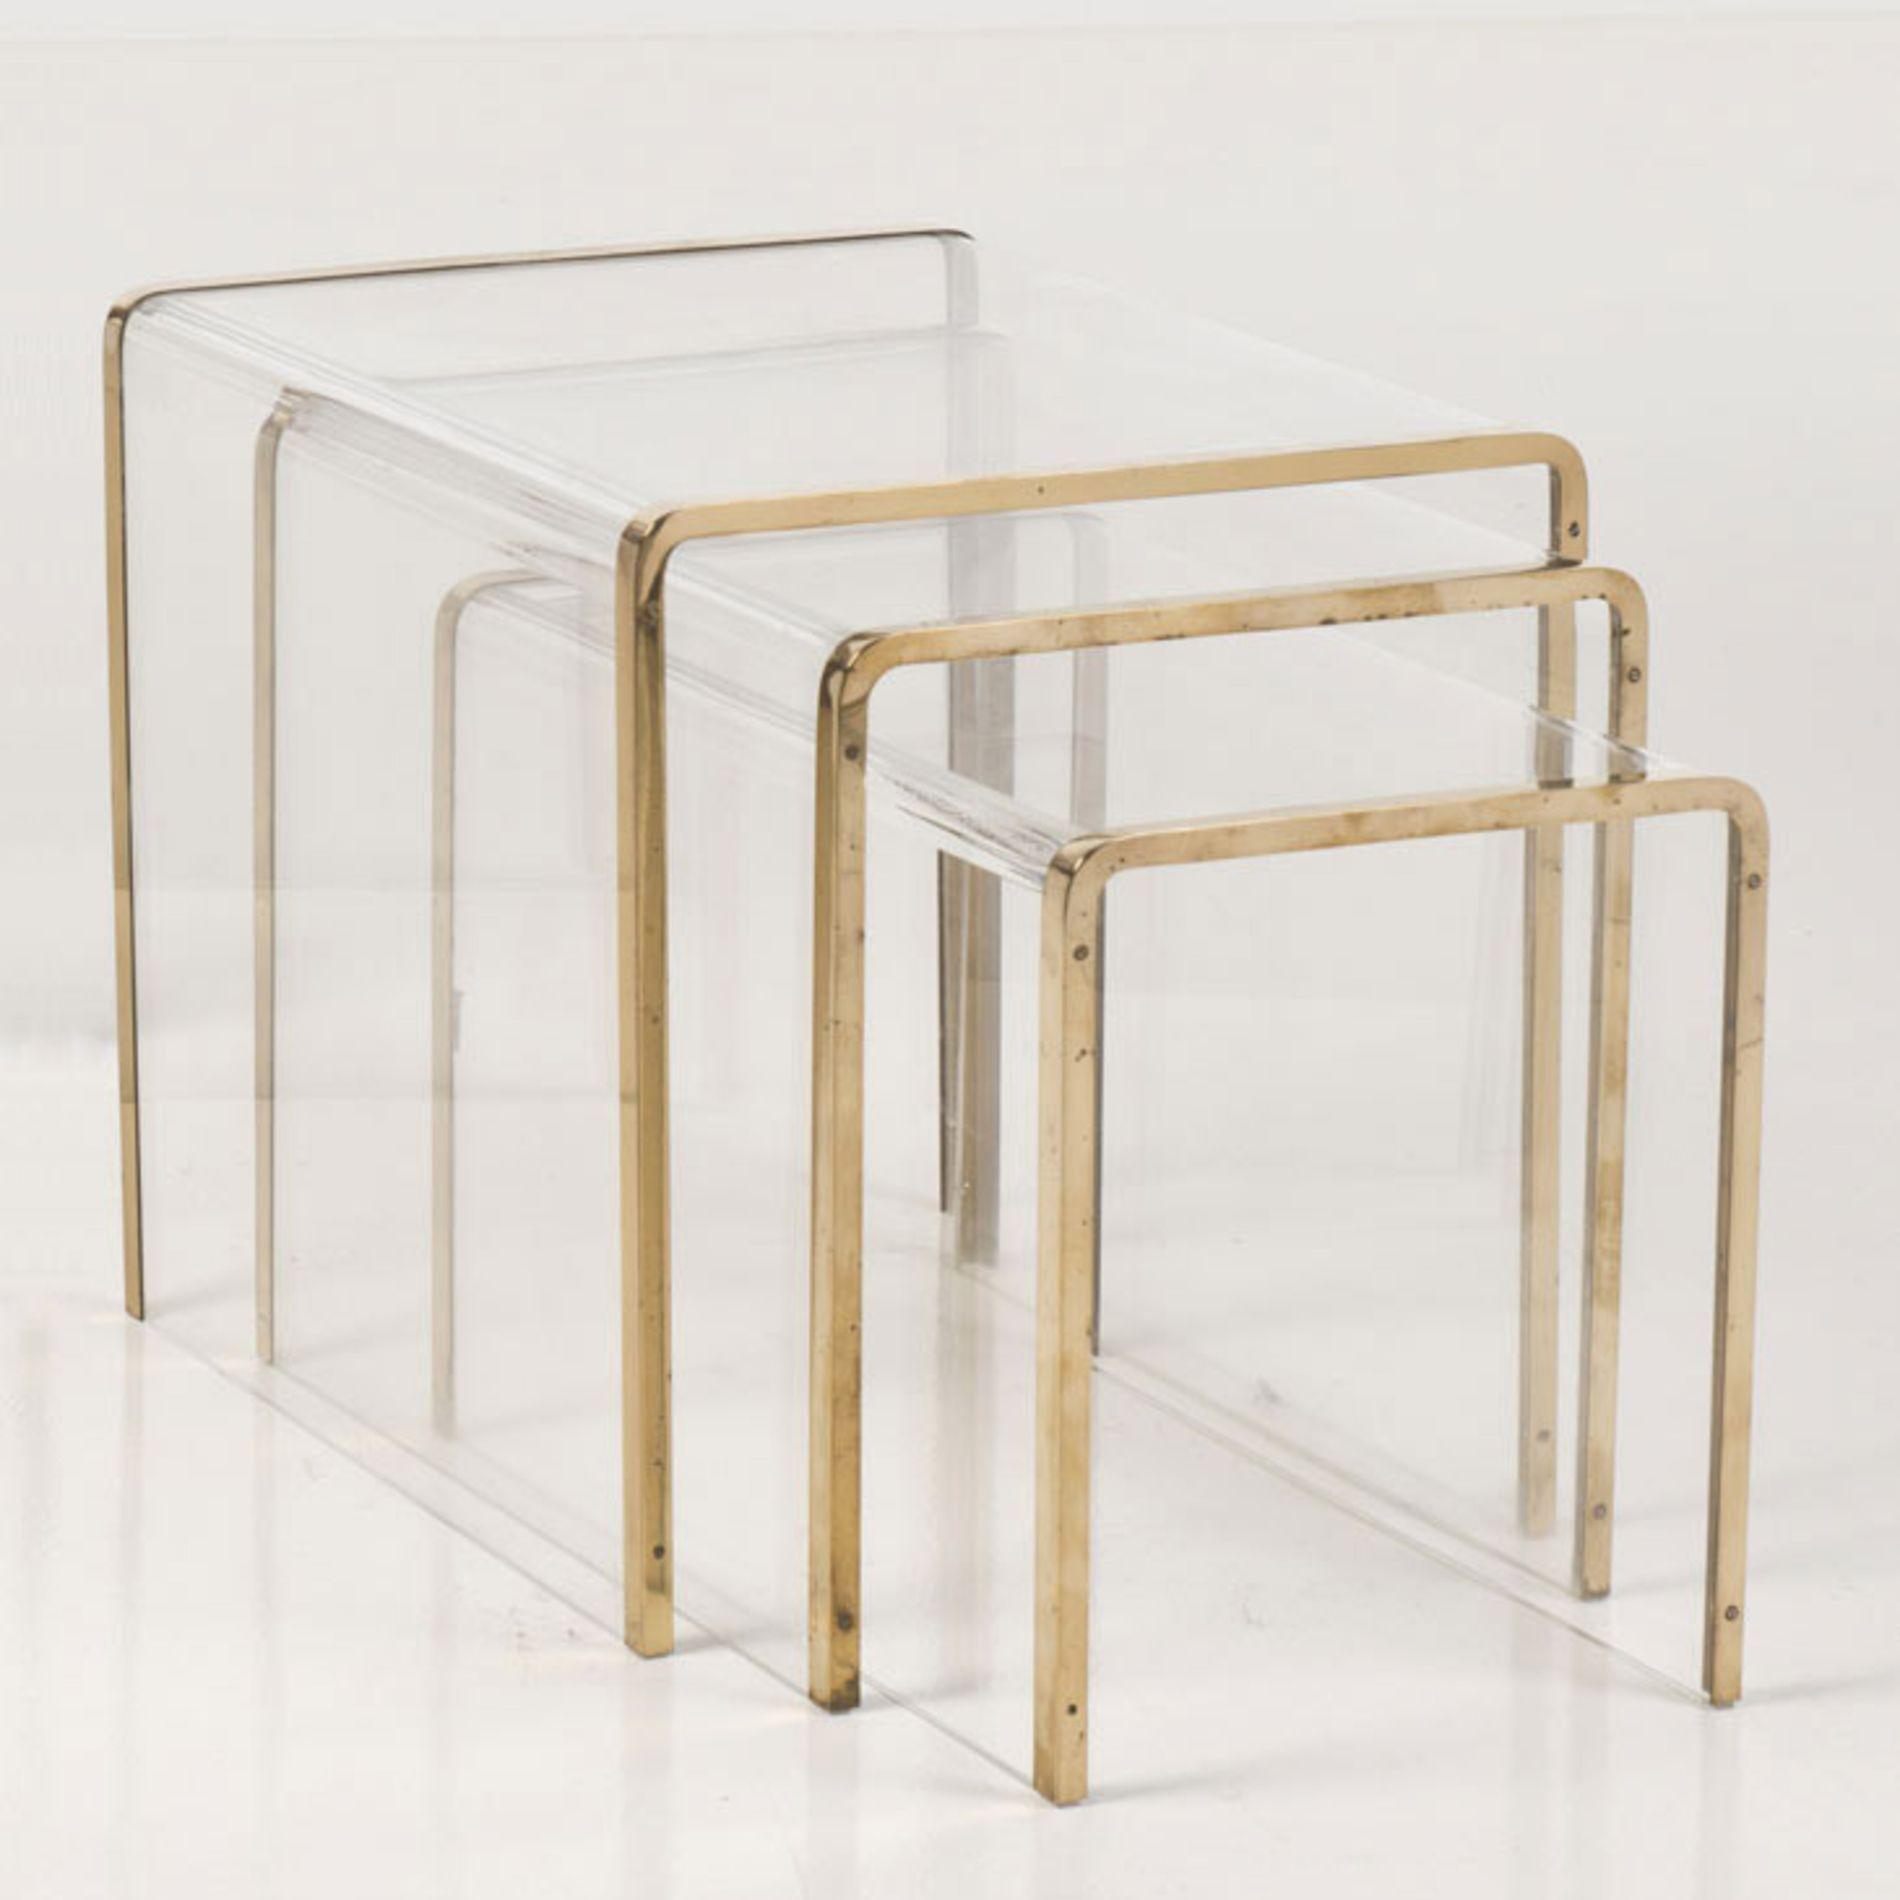 Gabriella crespi plexiglass and brass nesting tables - Table gigogne plexiglas ...